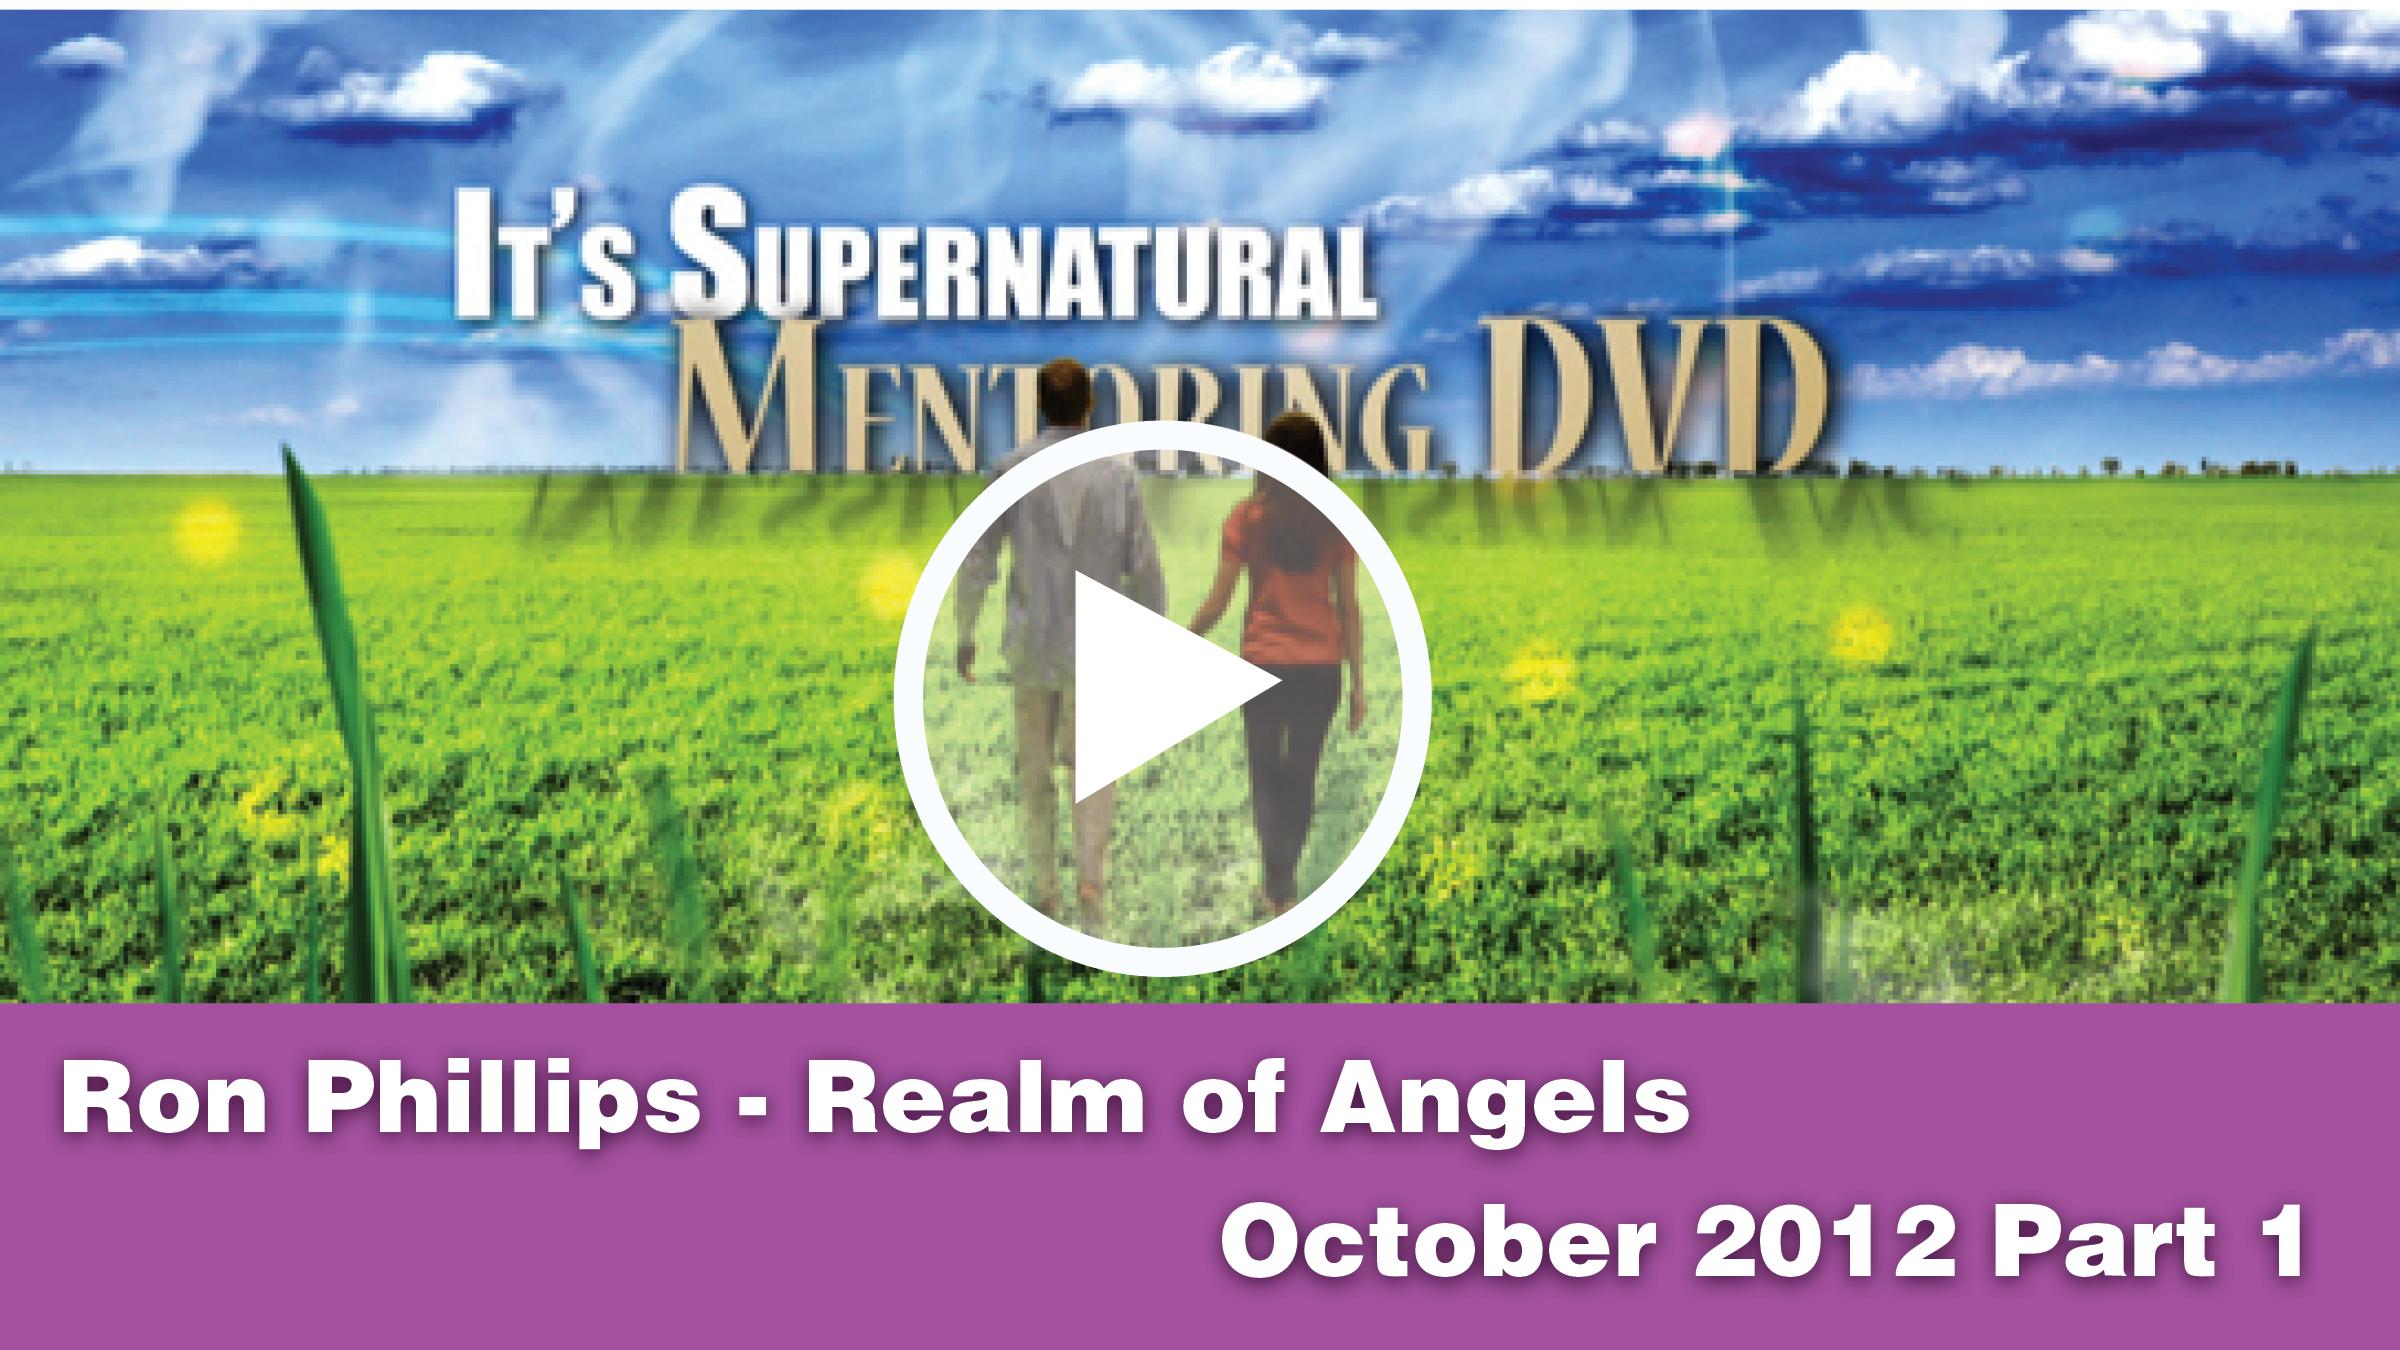 Guest: October 2012 Mentoring DVD Part 1 of 2